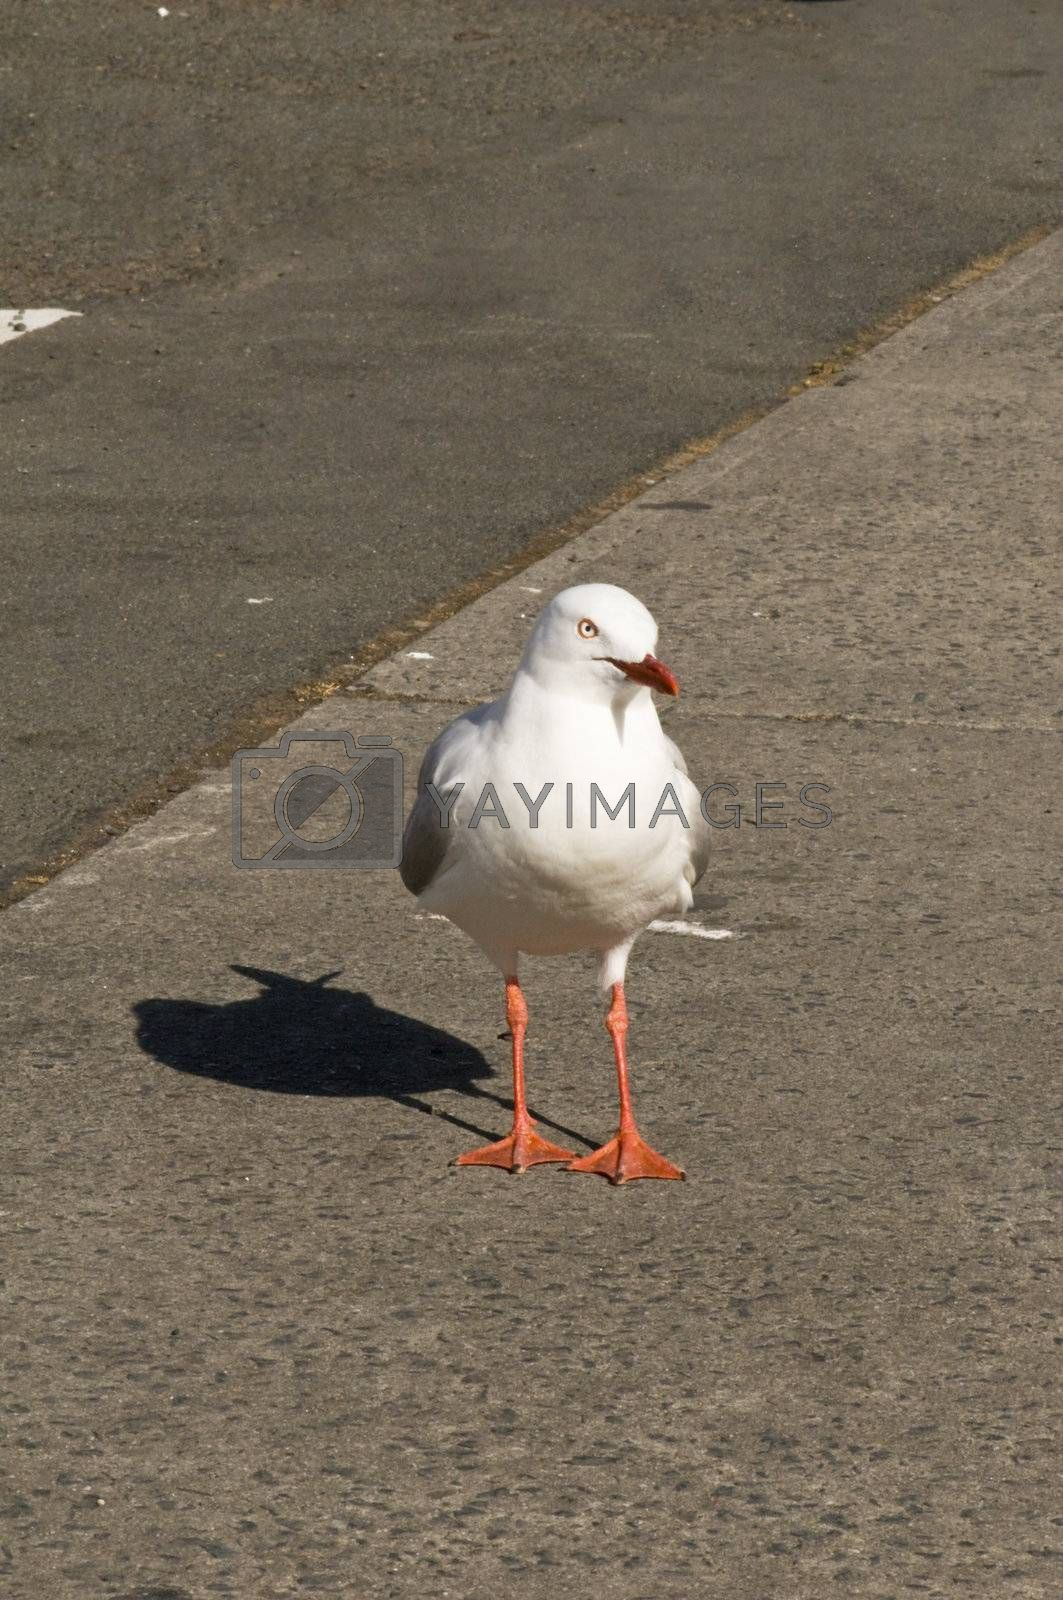 Curious seagull in the summer sun